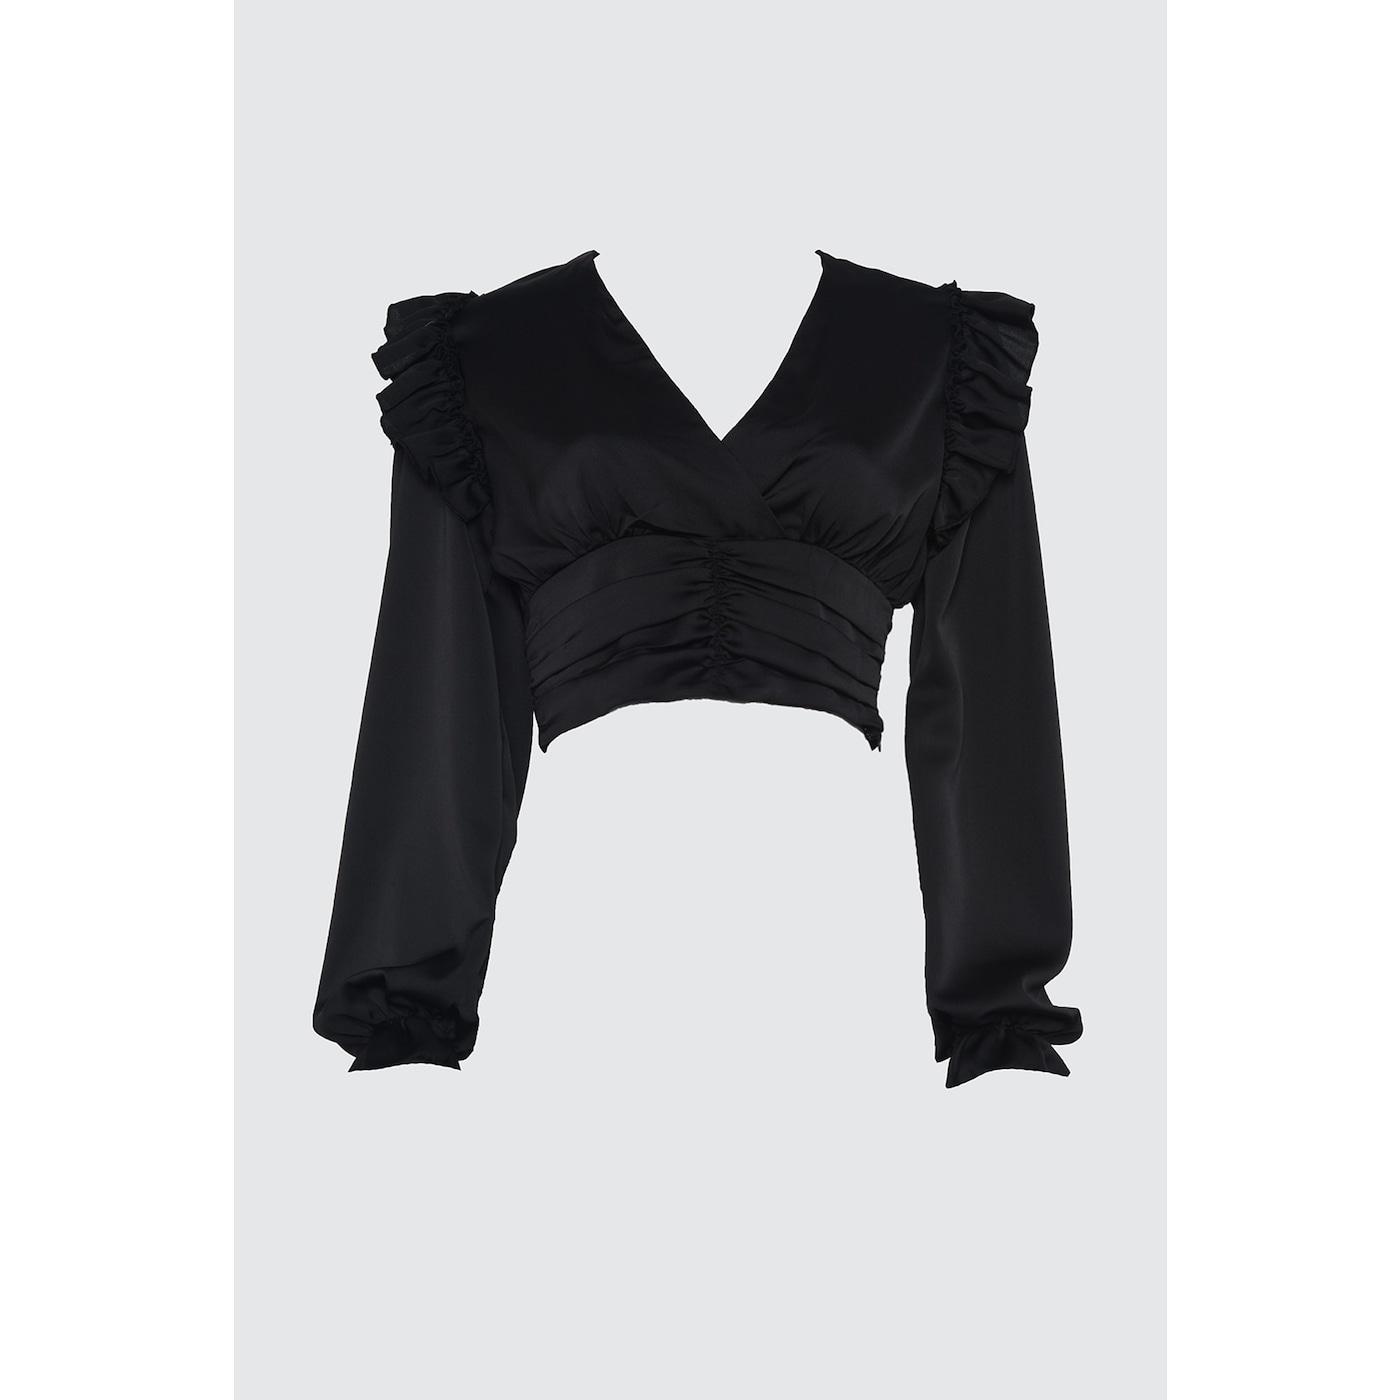 Trendyol Satin Blouse with Black Ruffin Detail dámské 34